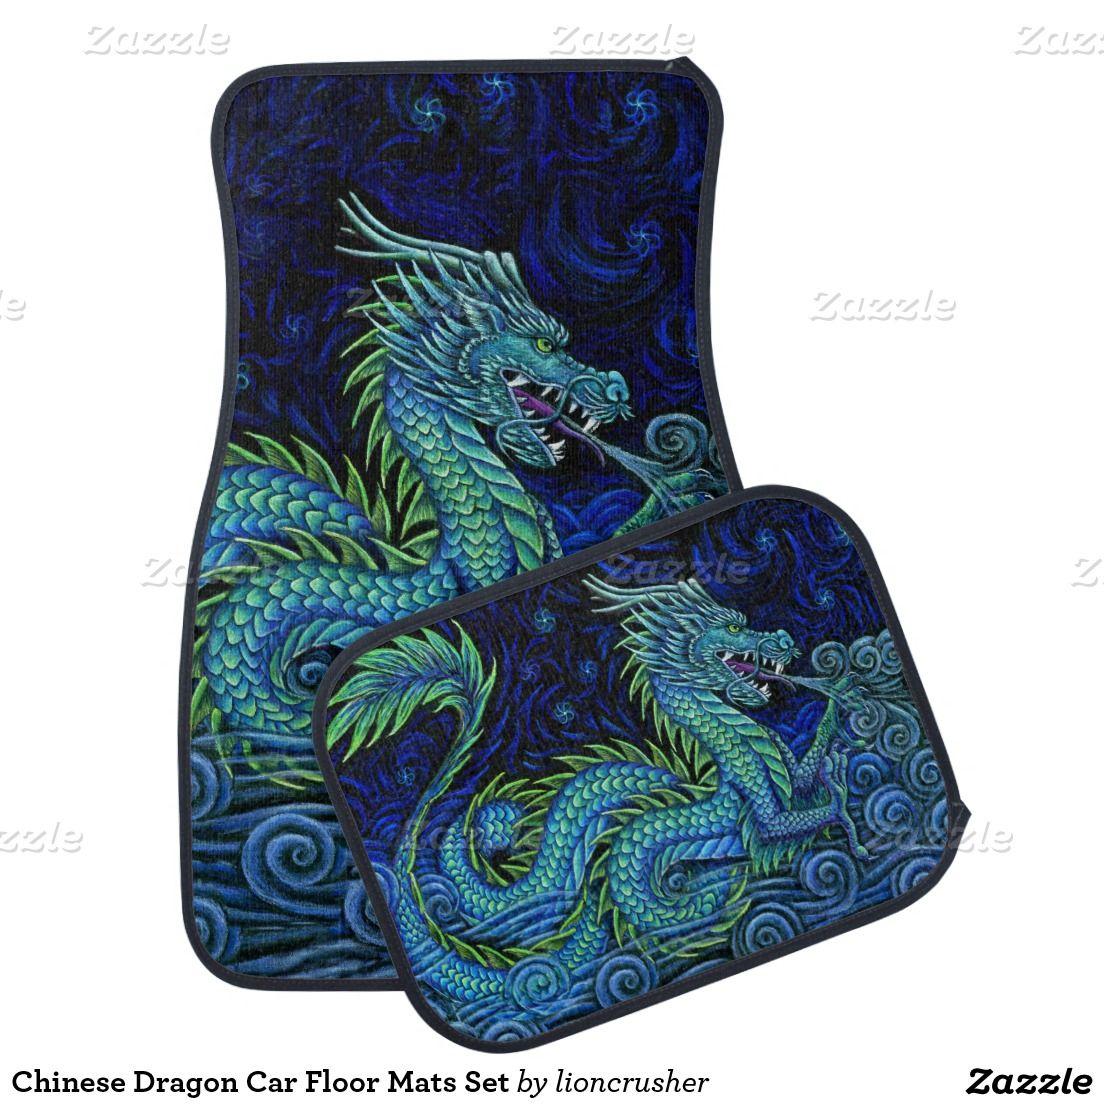 Chinese Dragon Car Floor Mats Set